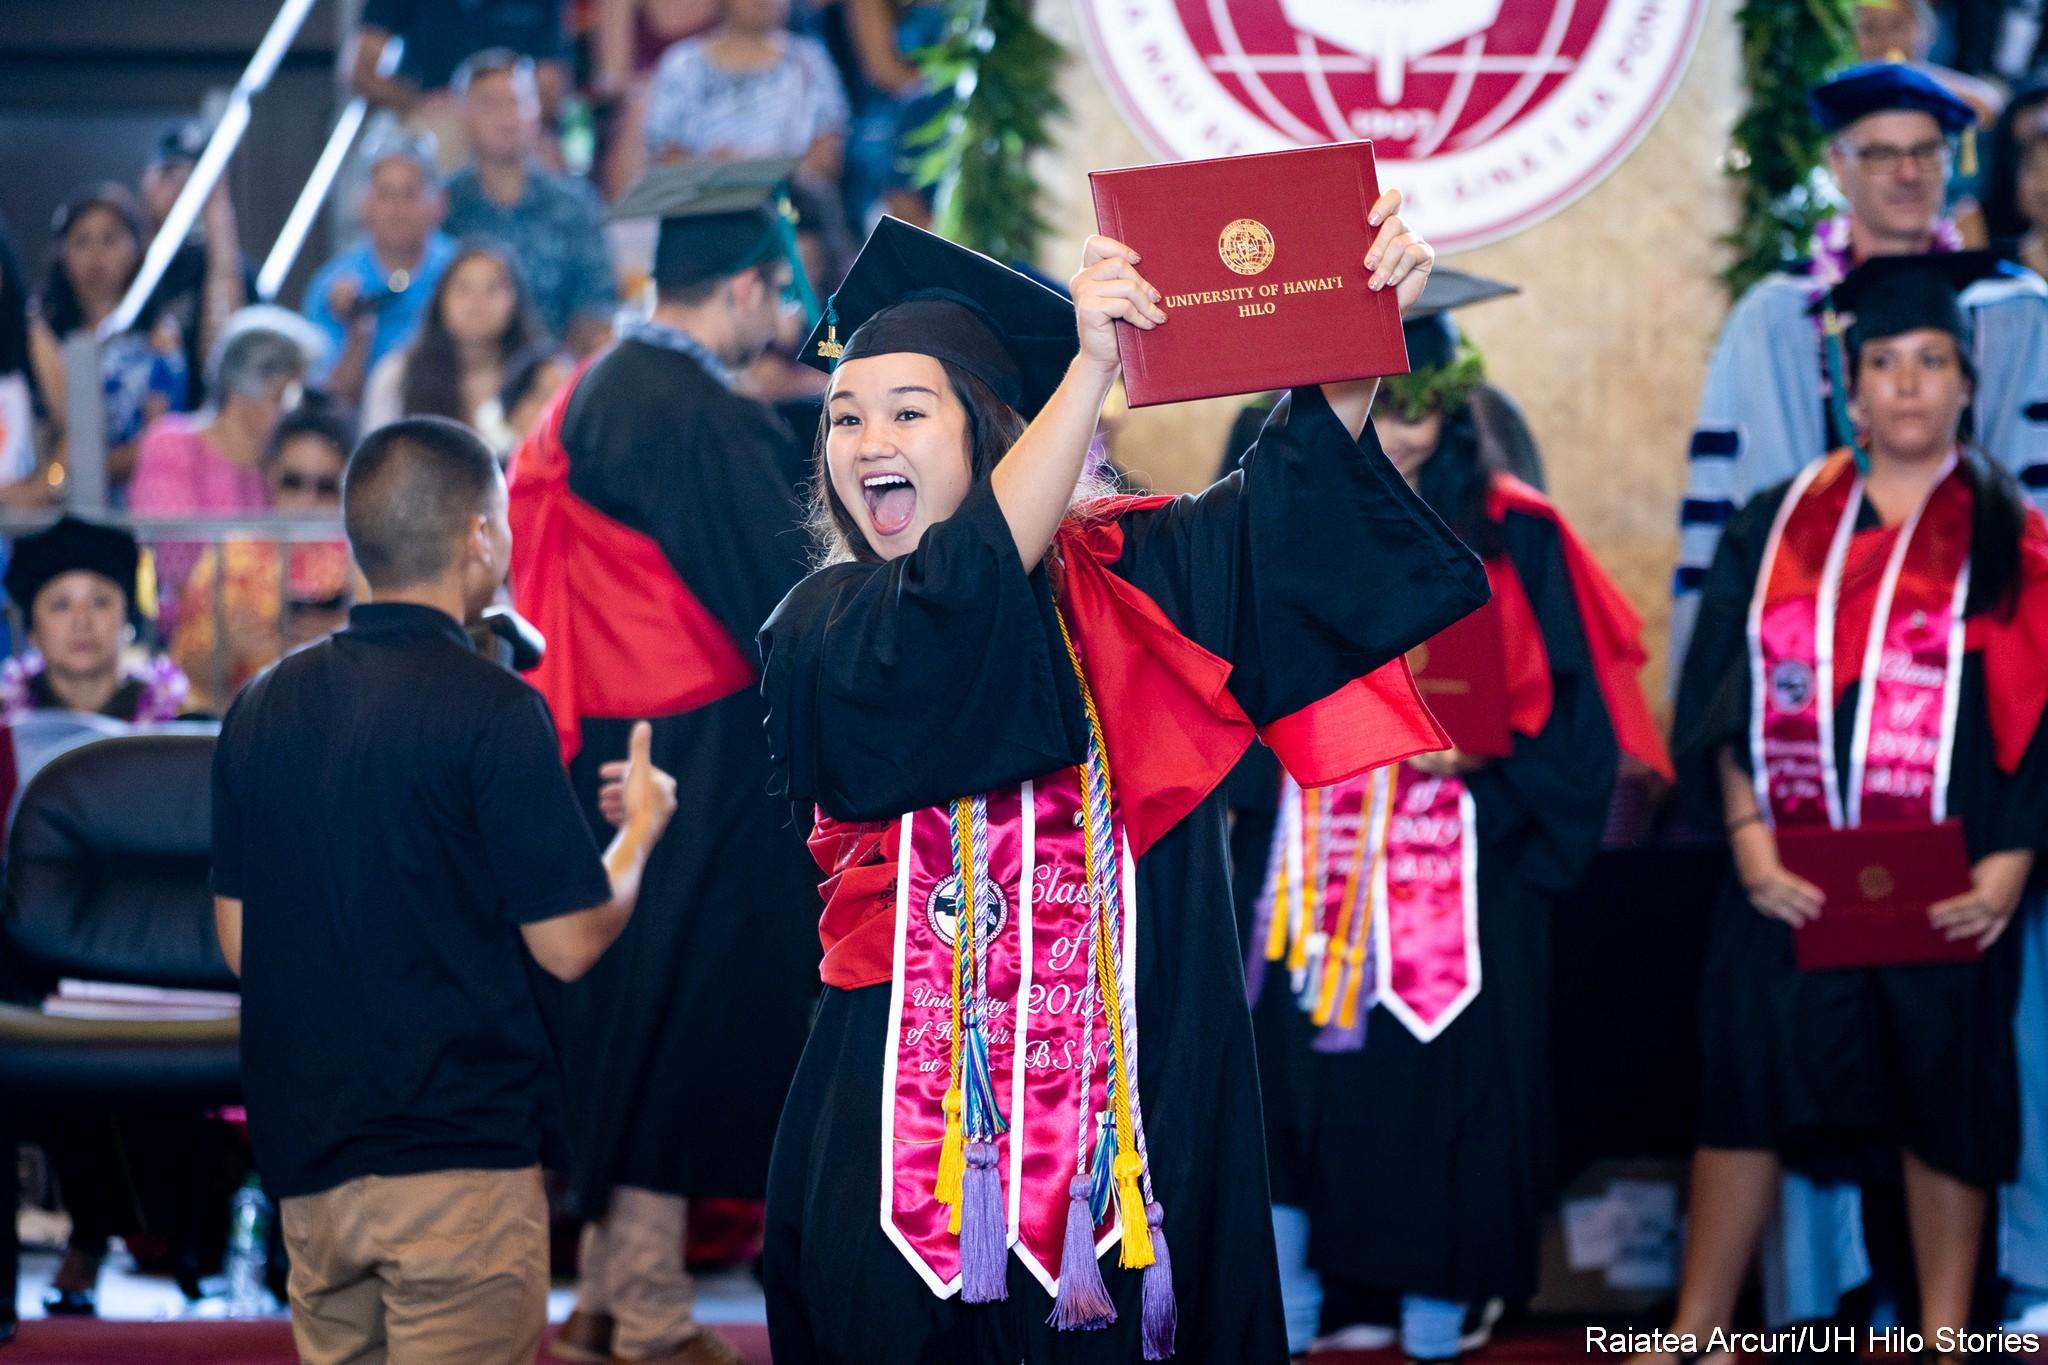 Female graduate jubilantly leaving dais holding up diploma.